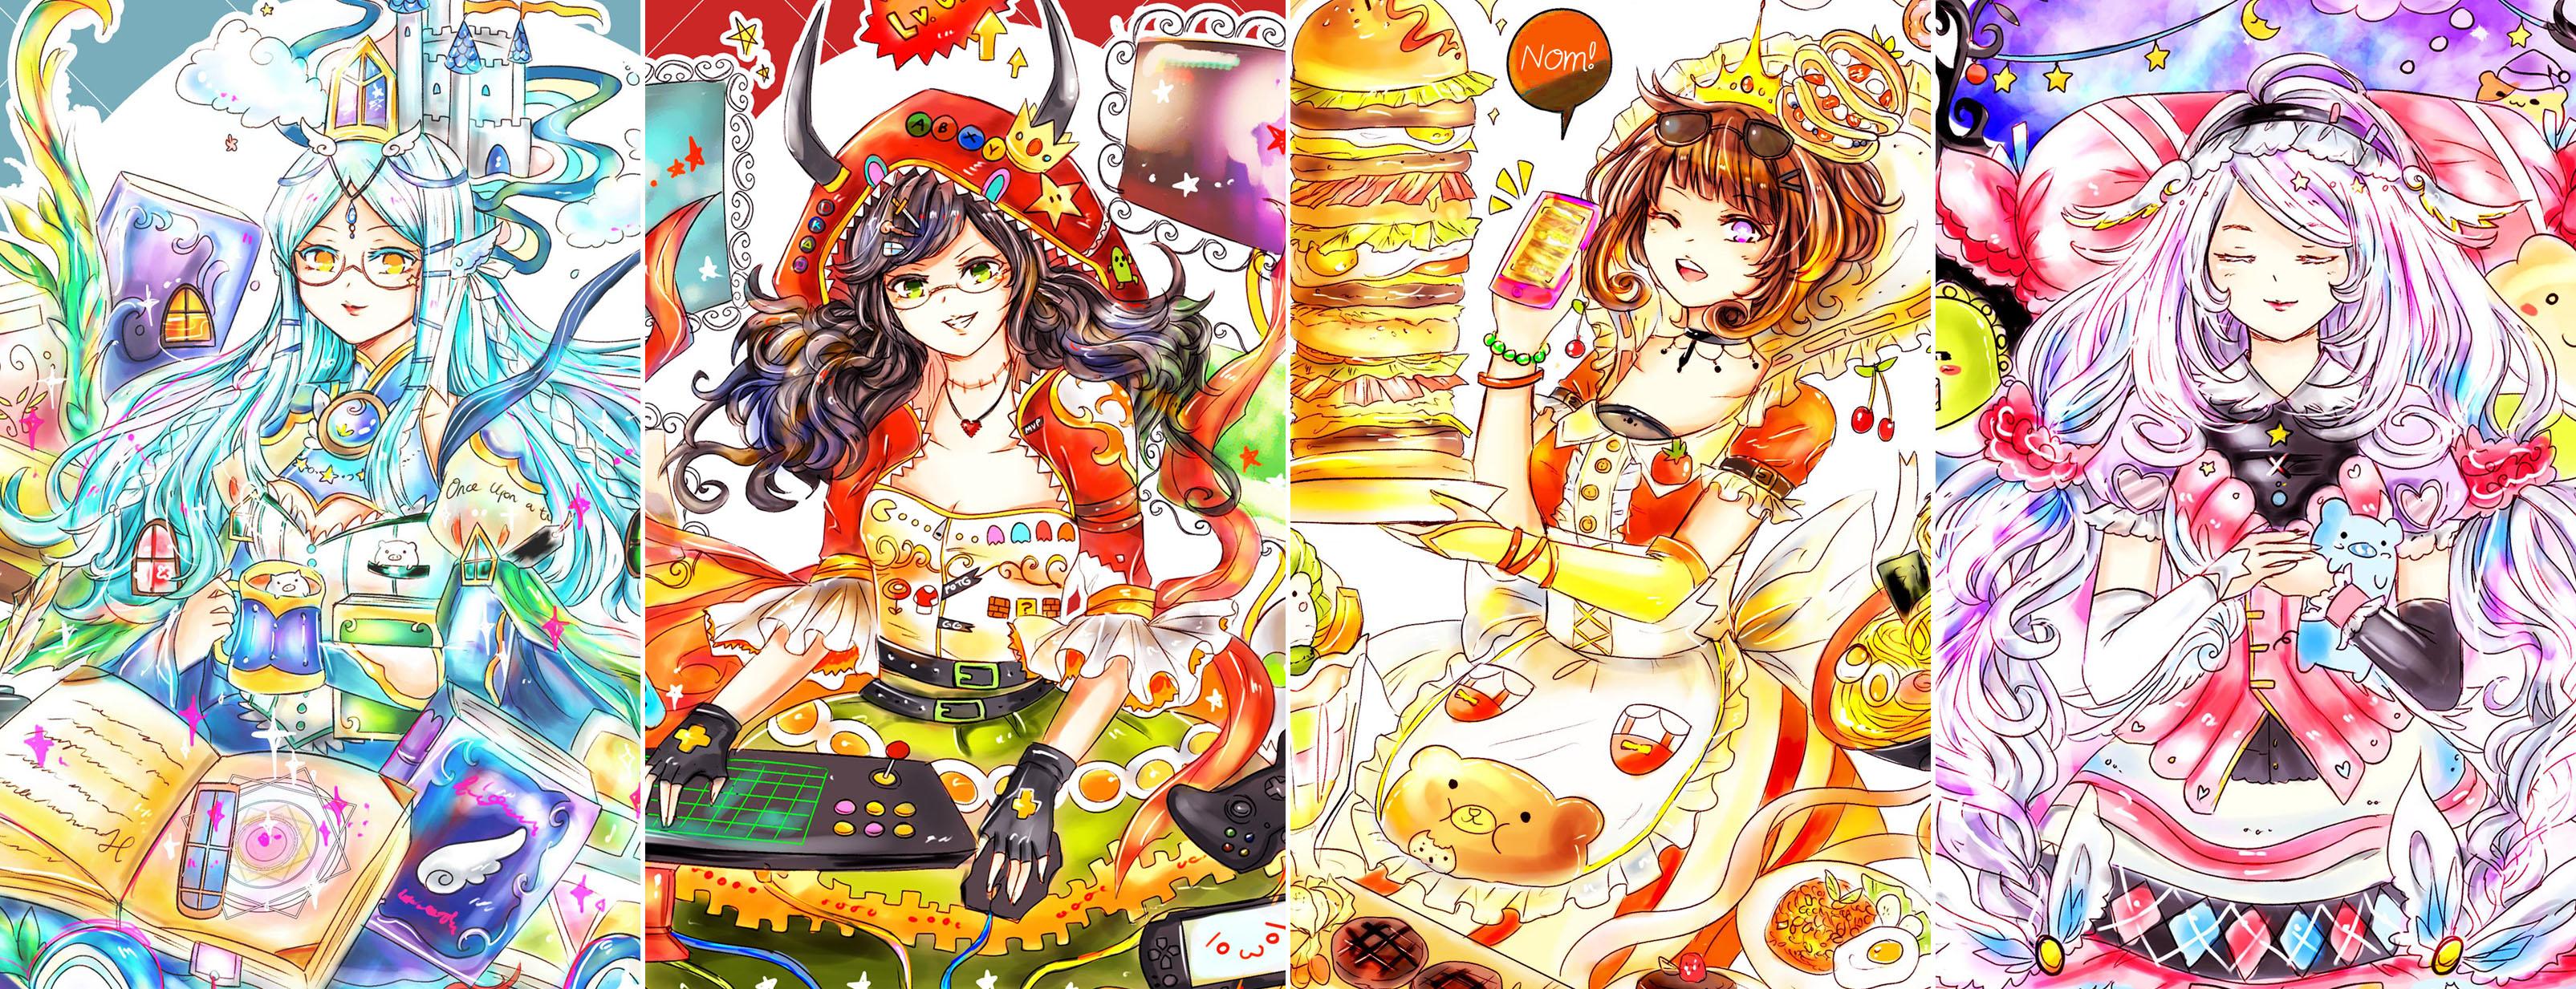 Princesses of Hobbies